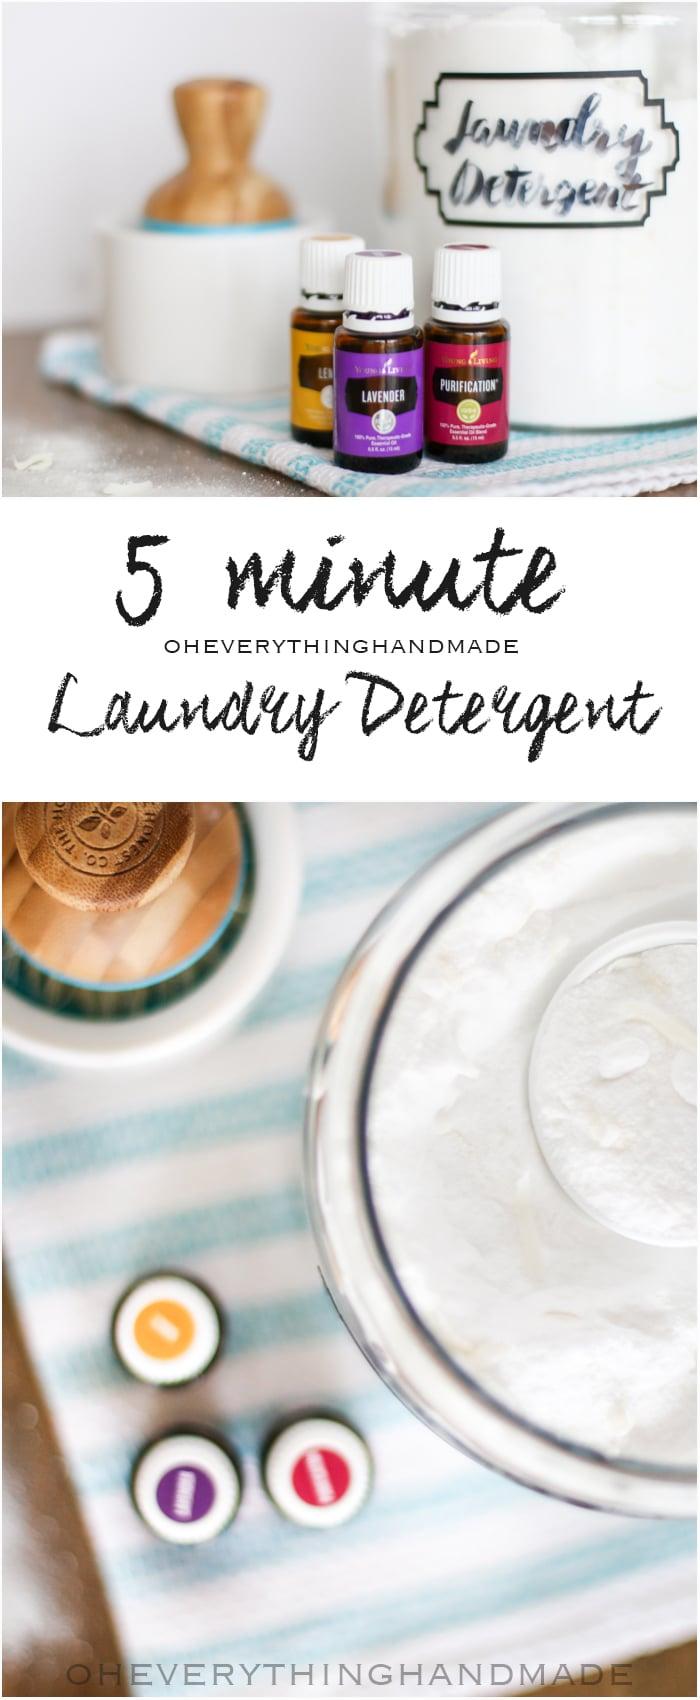 Laundry Detergent - with Essential Oils via Pinterest